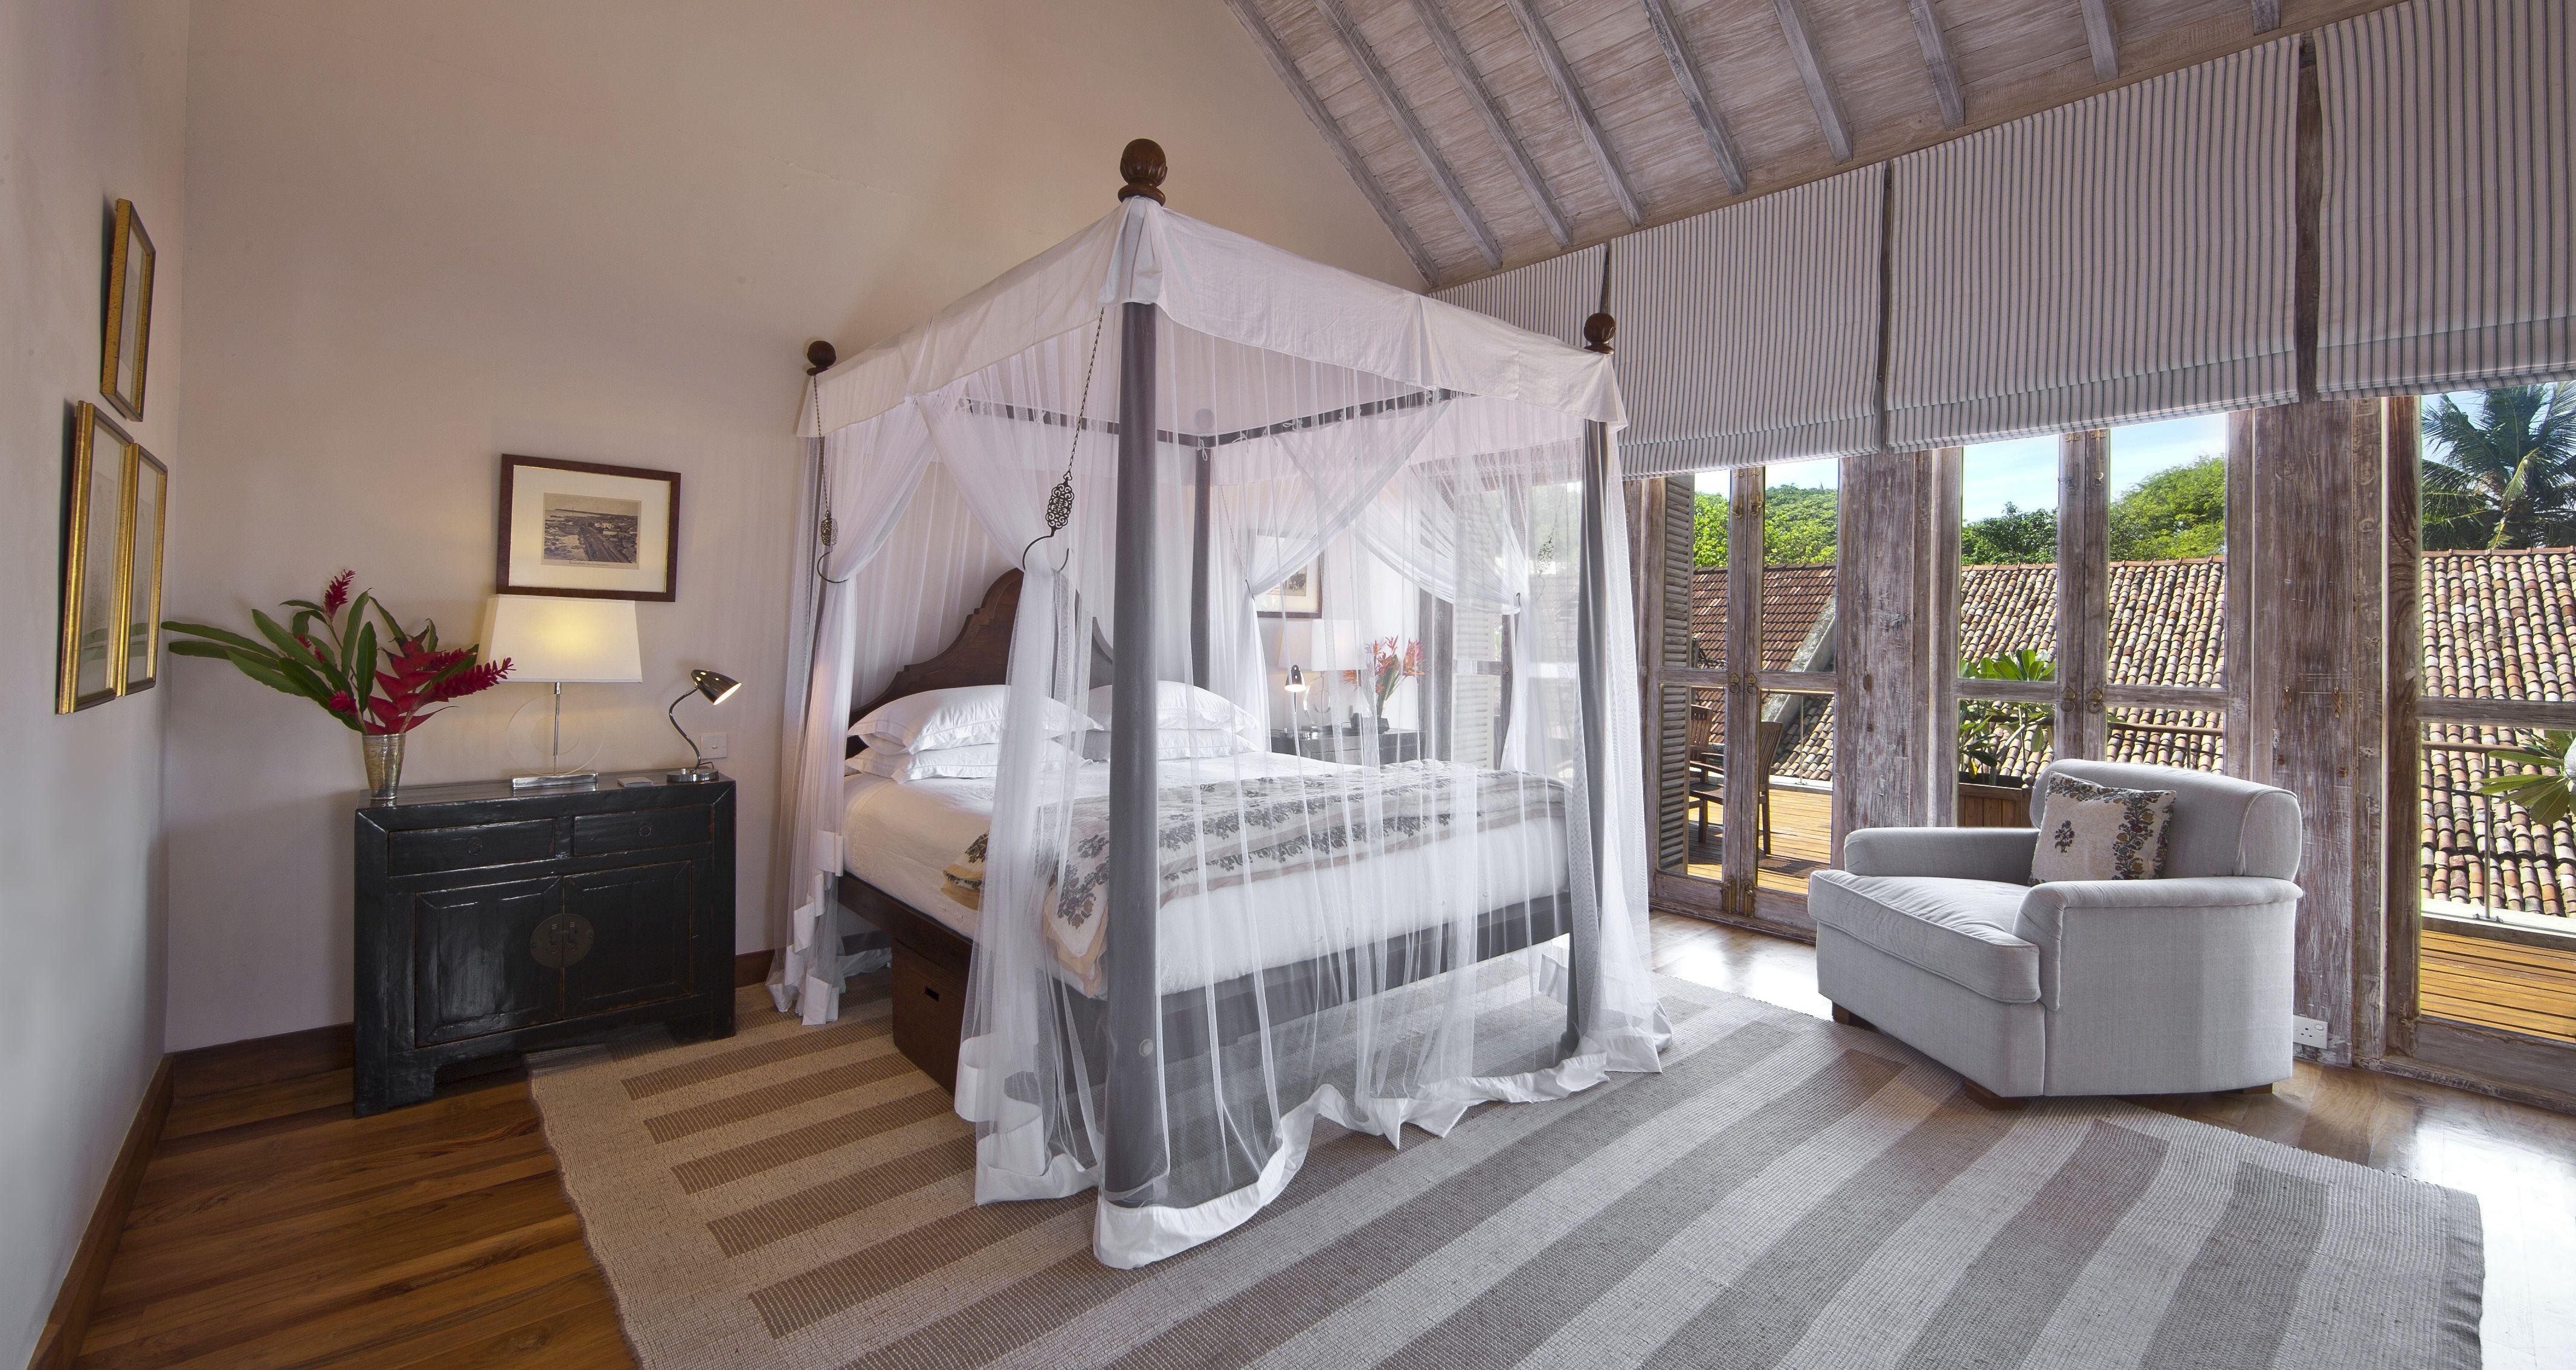 Bedroom Designs In Sri Lanka 20-middle-street-galle-sri-lanka-bedroom-in-main-house-ampersand